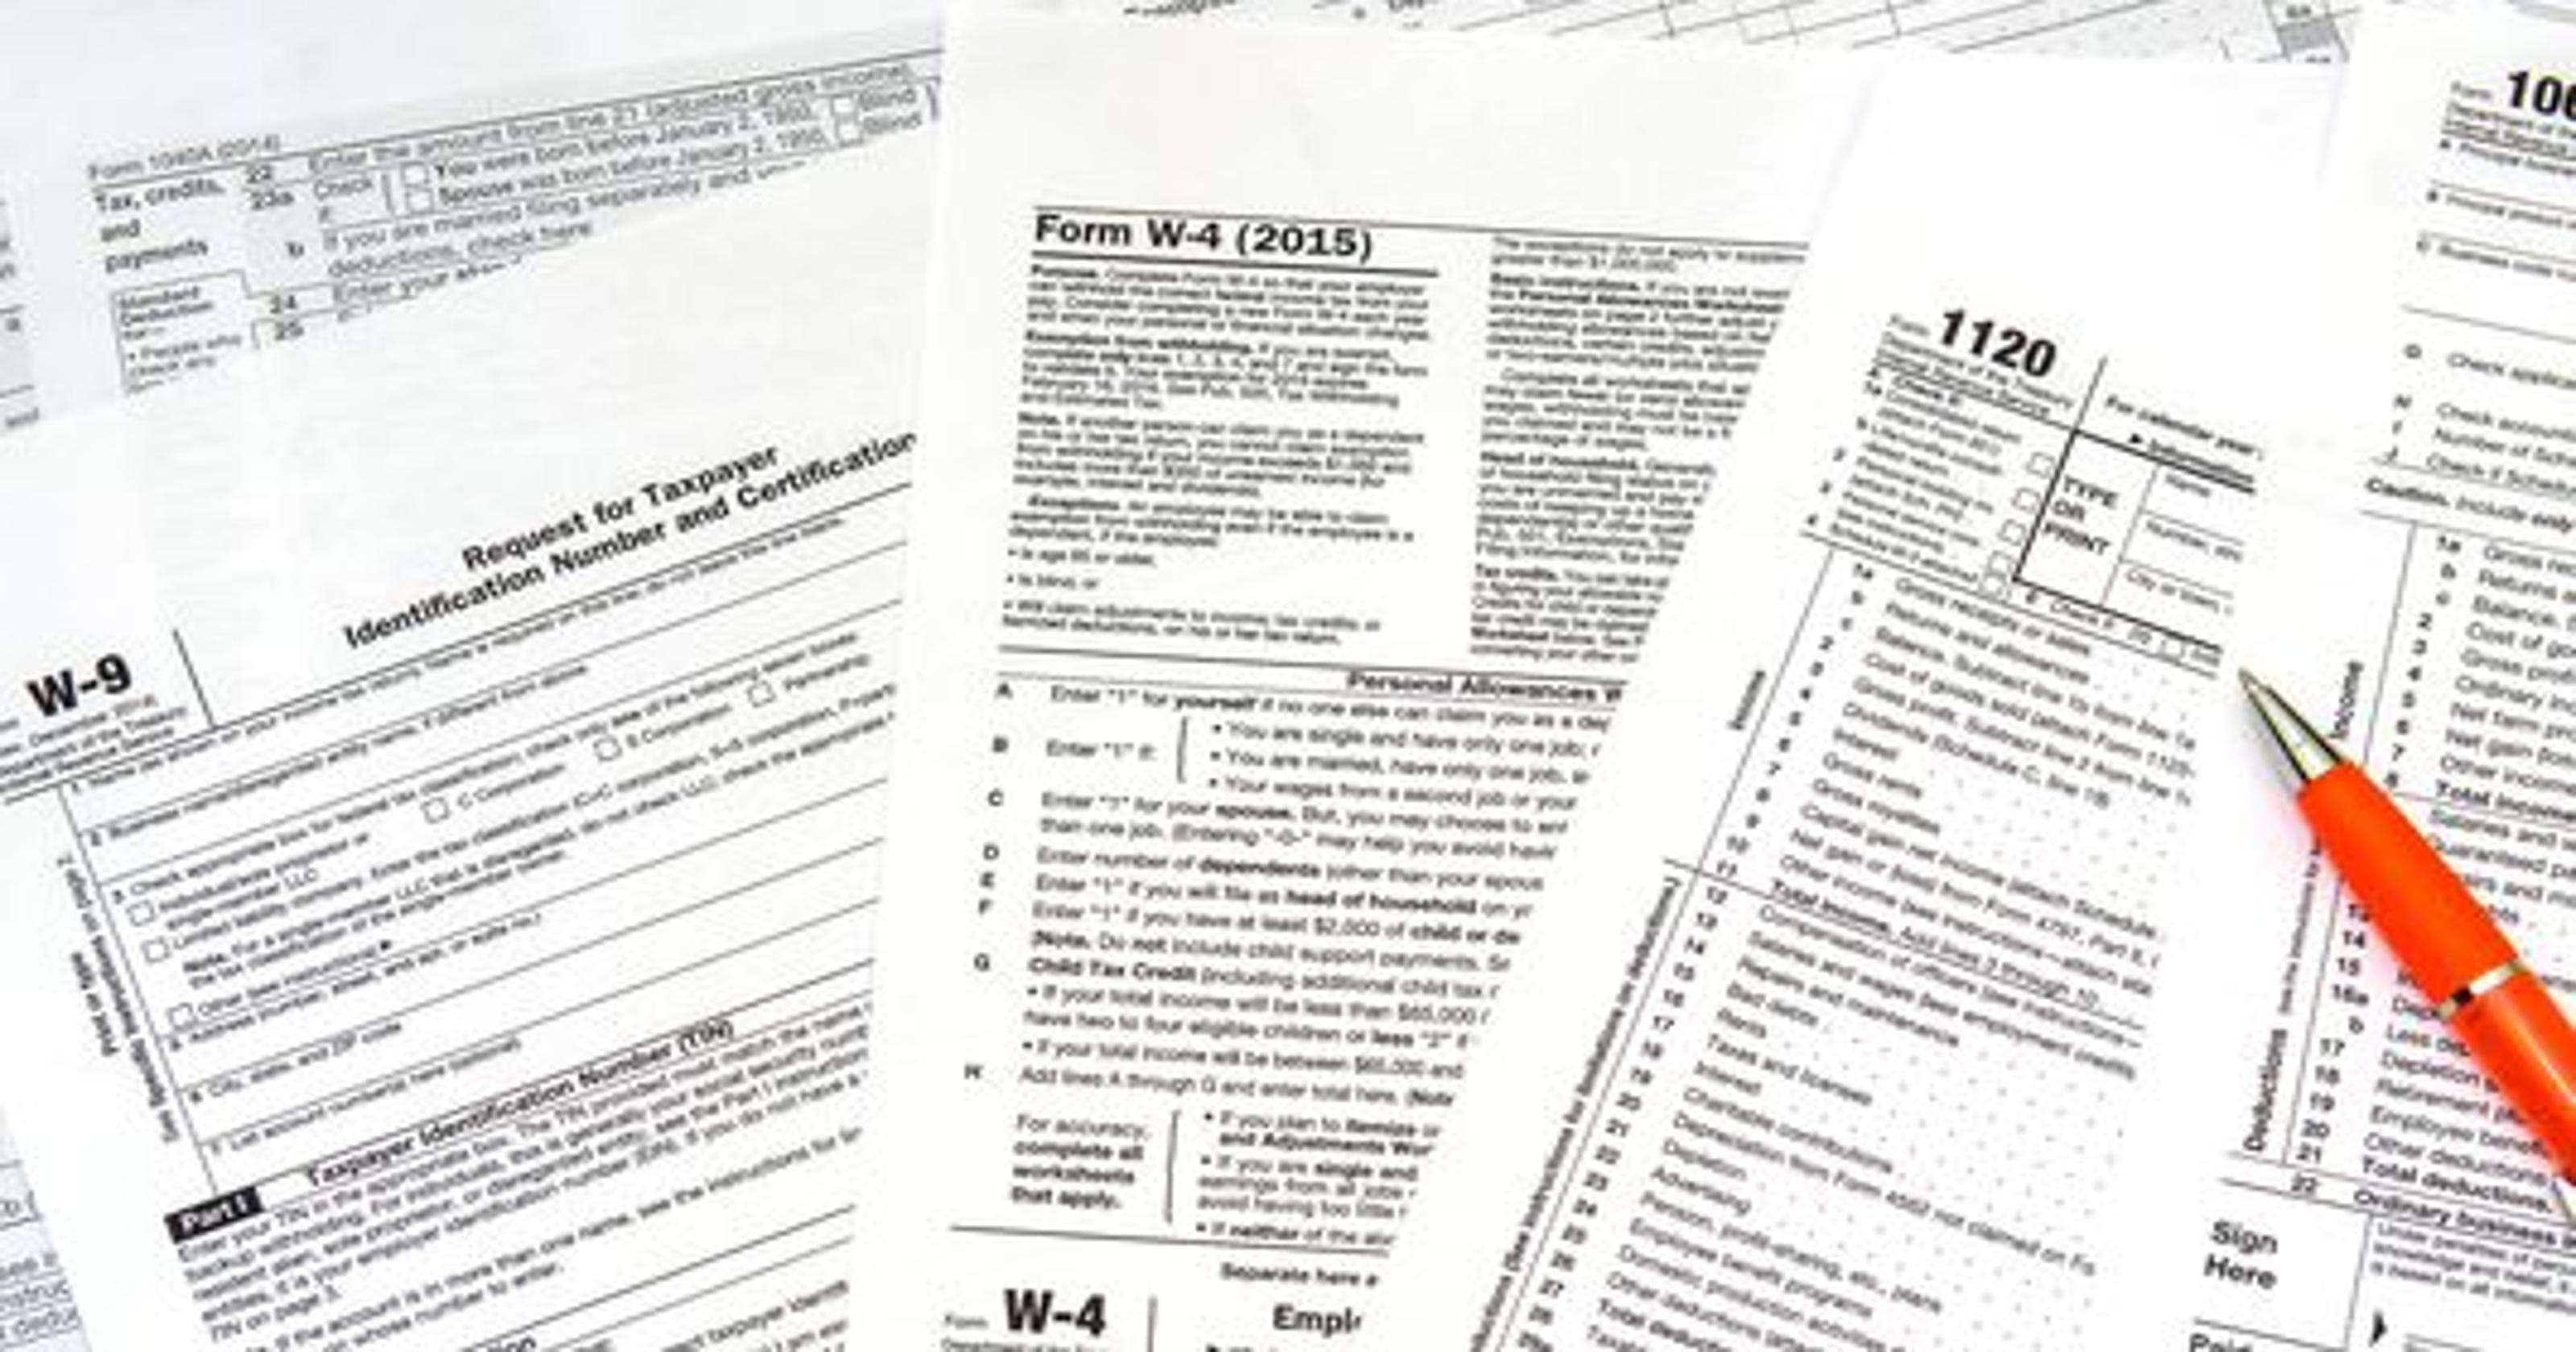 Arizona finishing fix of tax glitch affecting 580,000